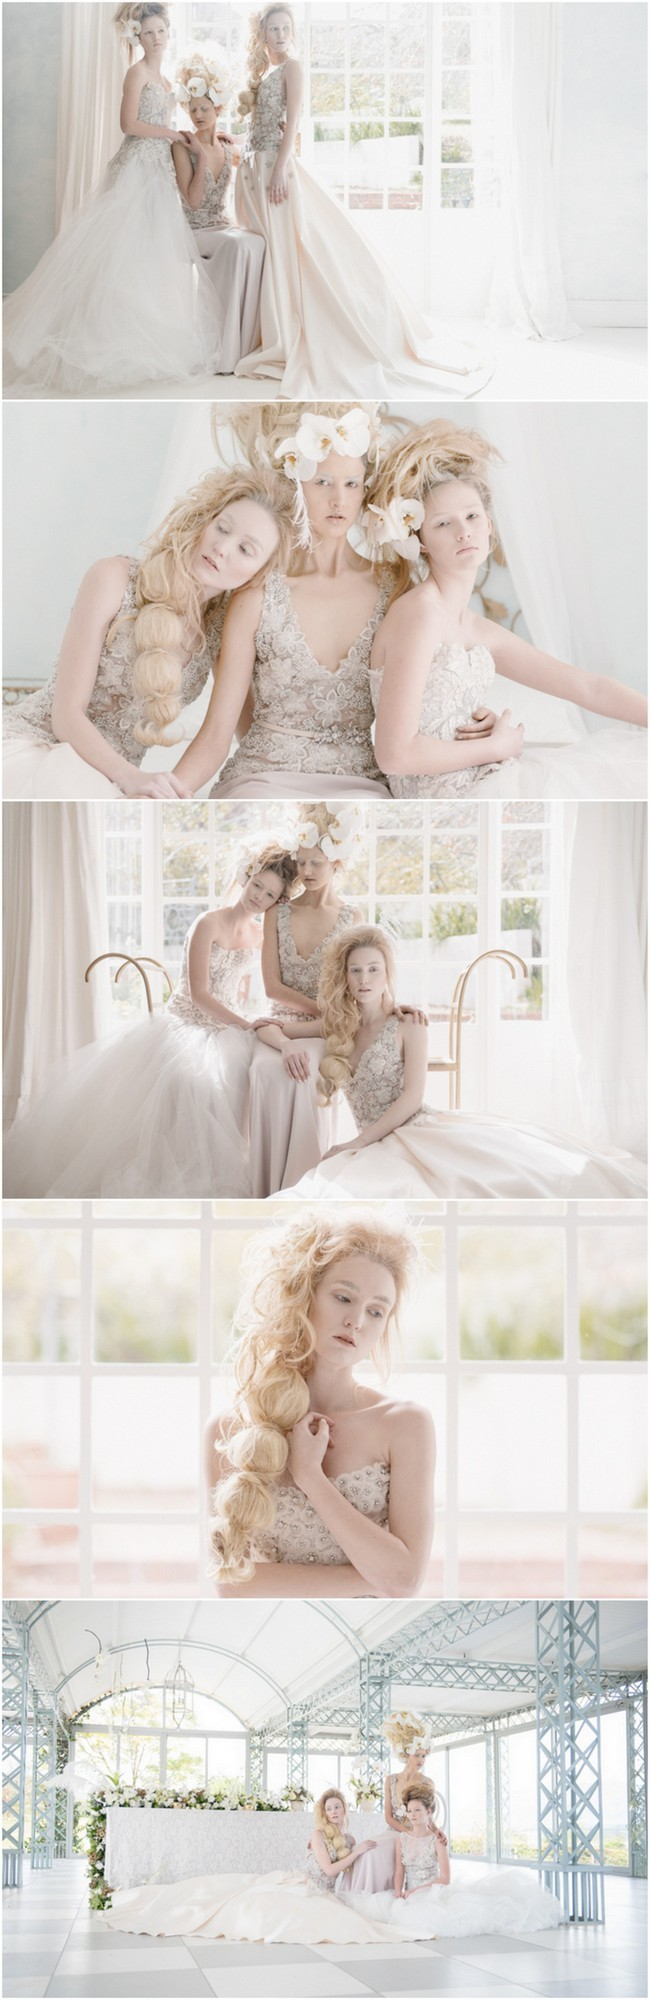 Marie Antoinette Wedding Ideas - ST Photography